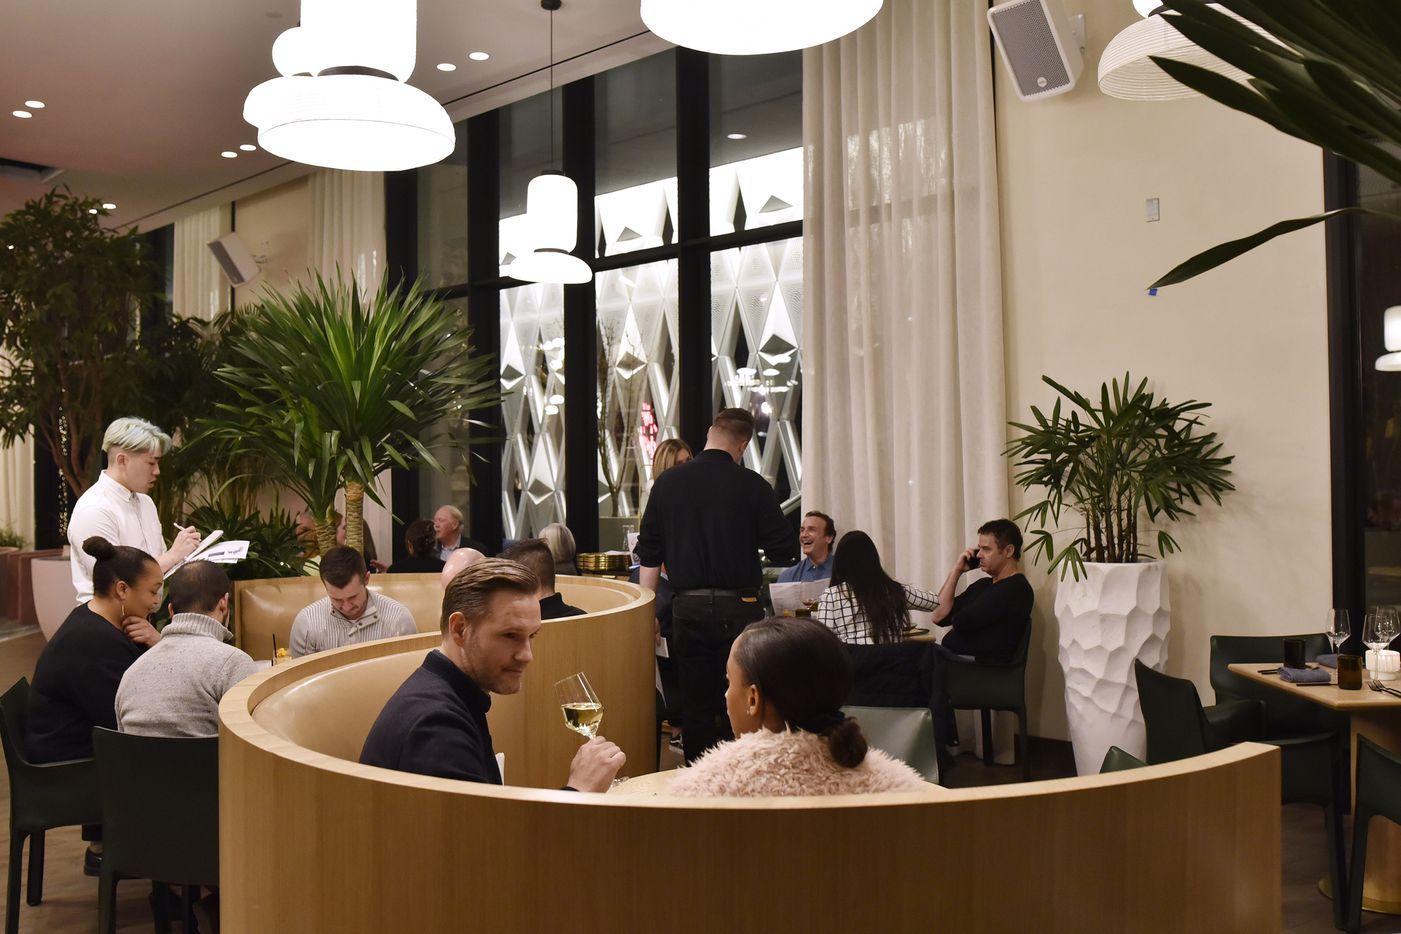 The main dinning room at Commons Club restaurant inside Virgin Hotel in Dallas, Dec. 10, 2019.